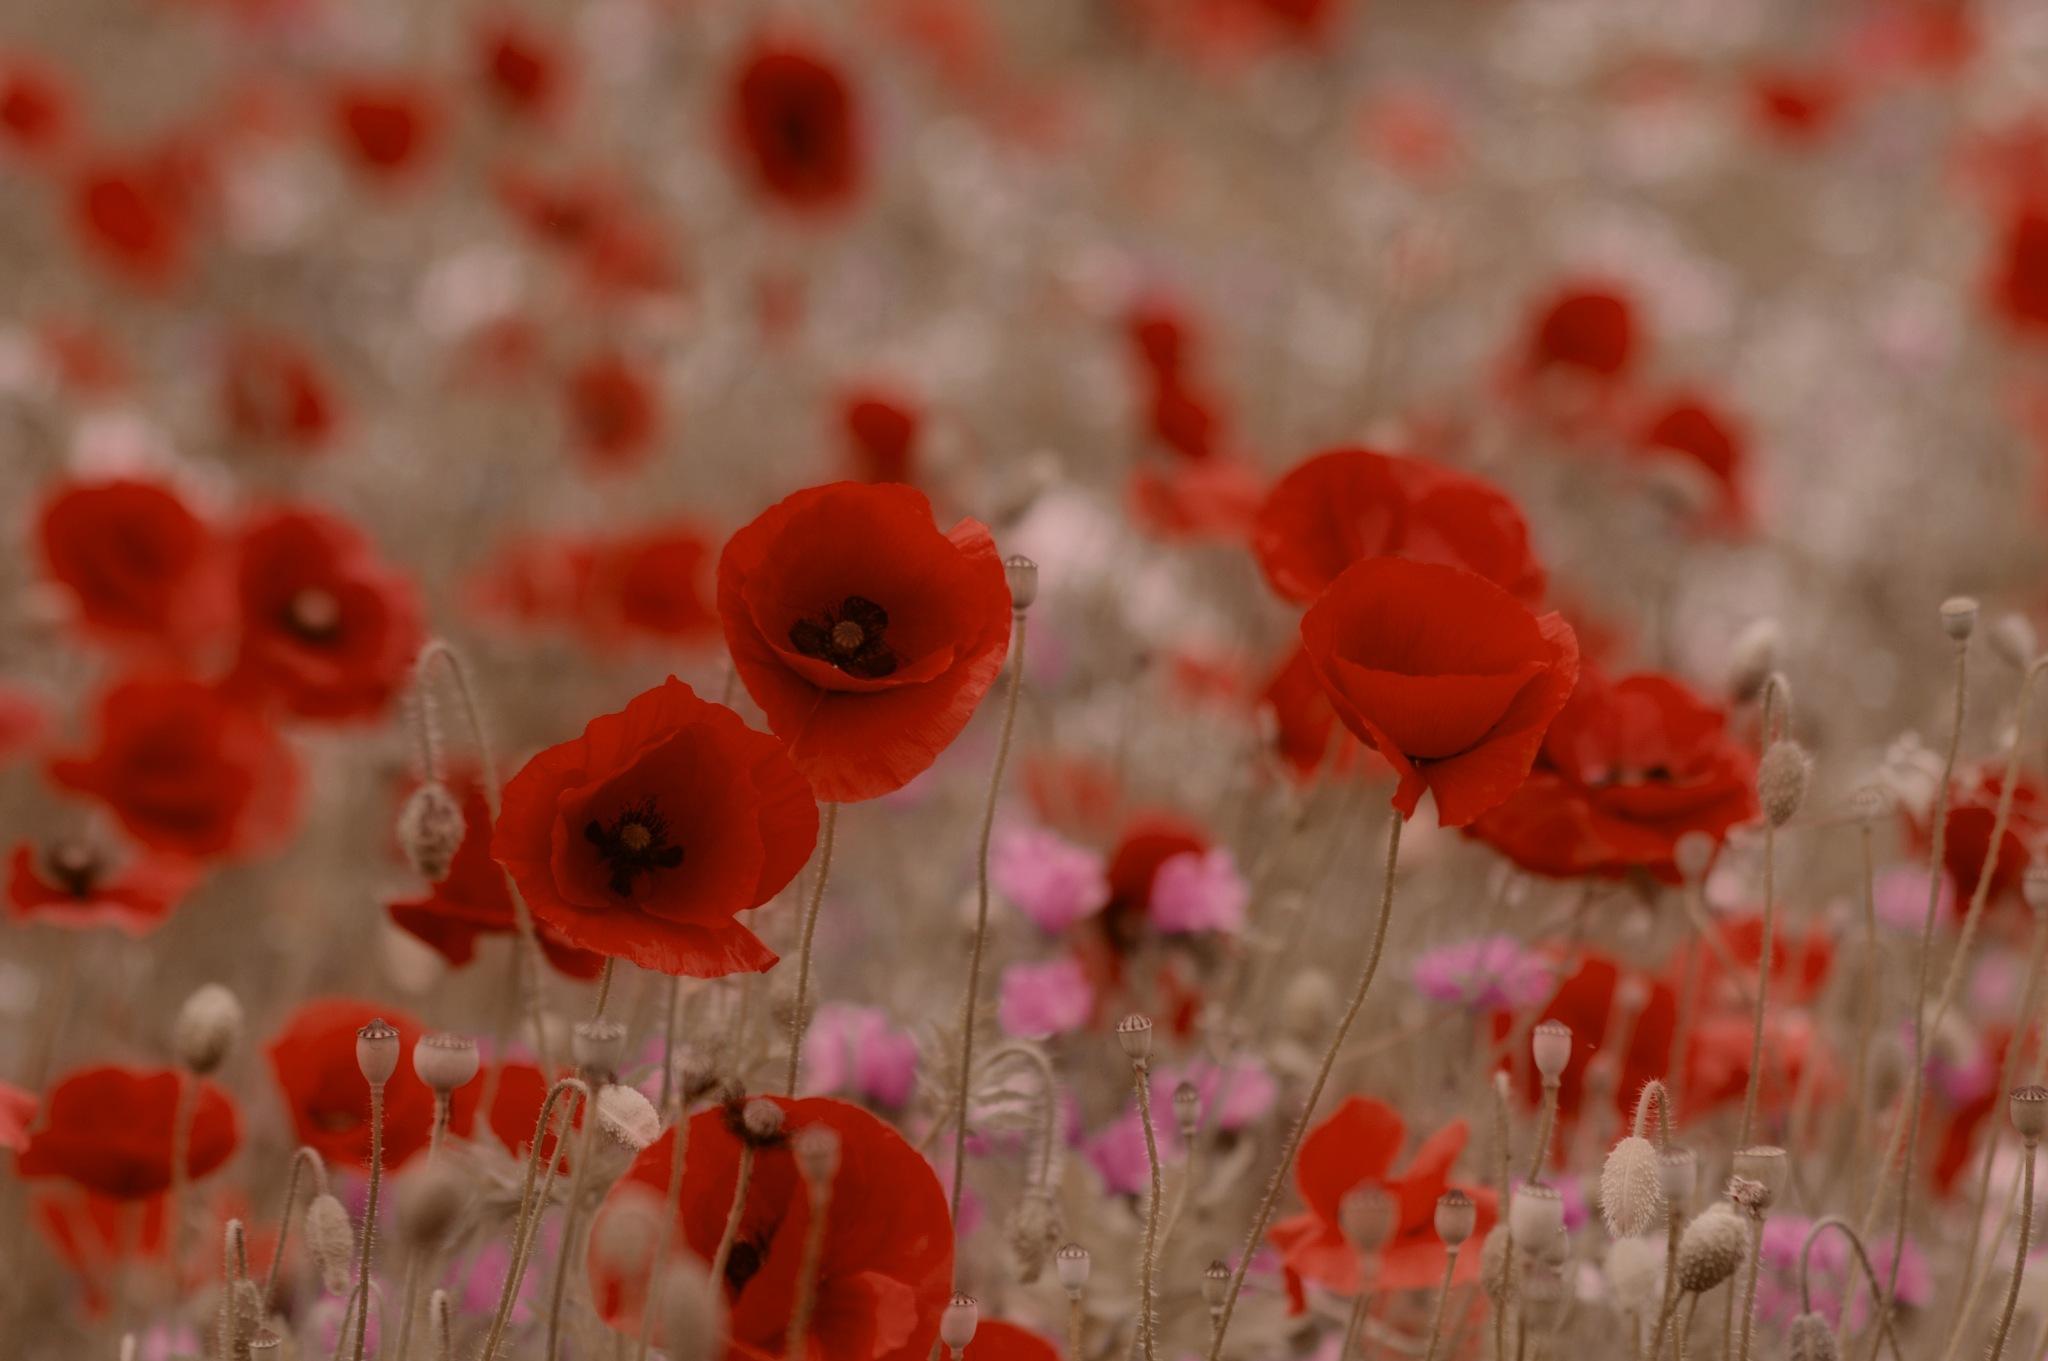 Rememberence Sunday by Mark Pemberton